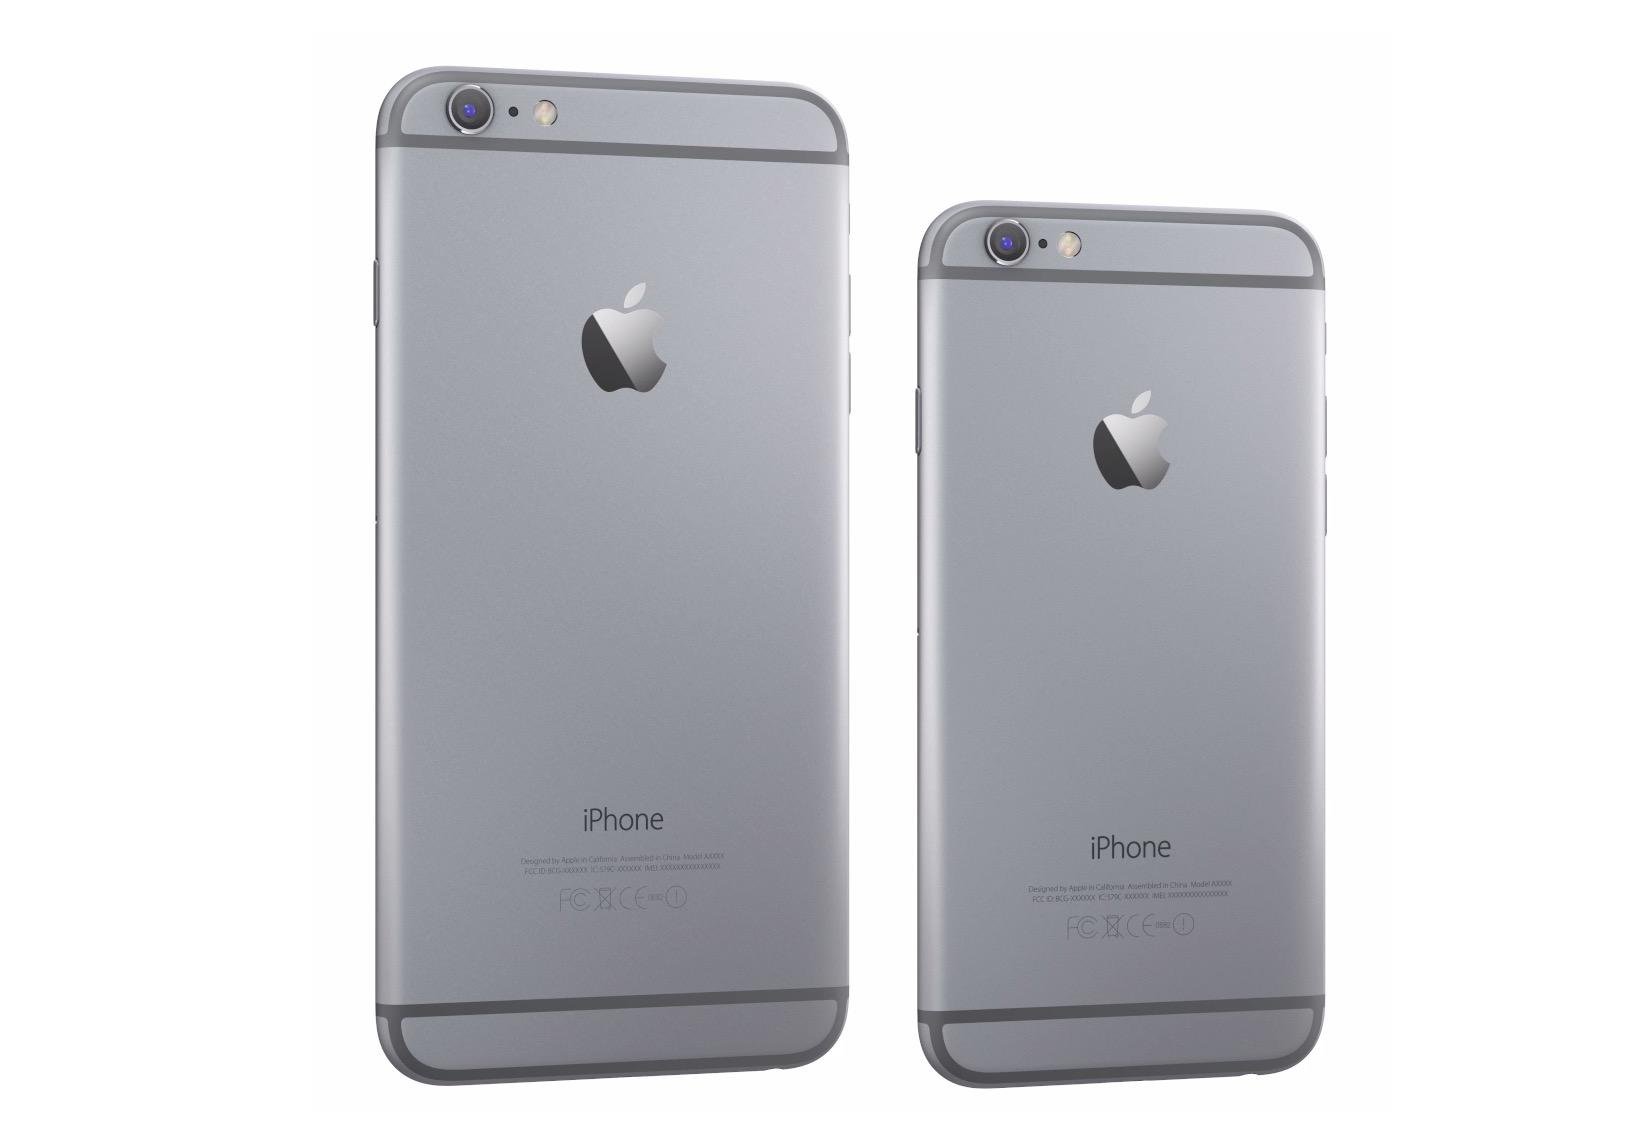 La fotocamera di iPhone 6 Plus